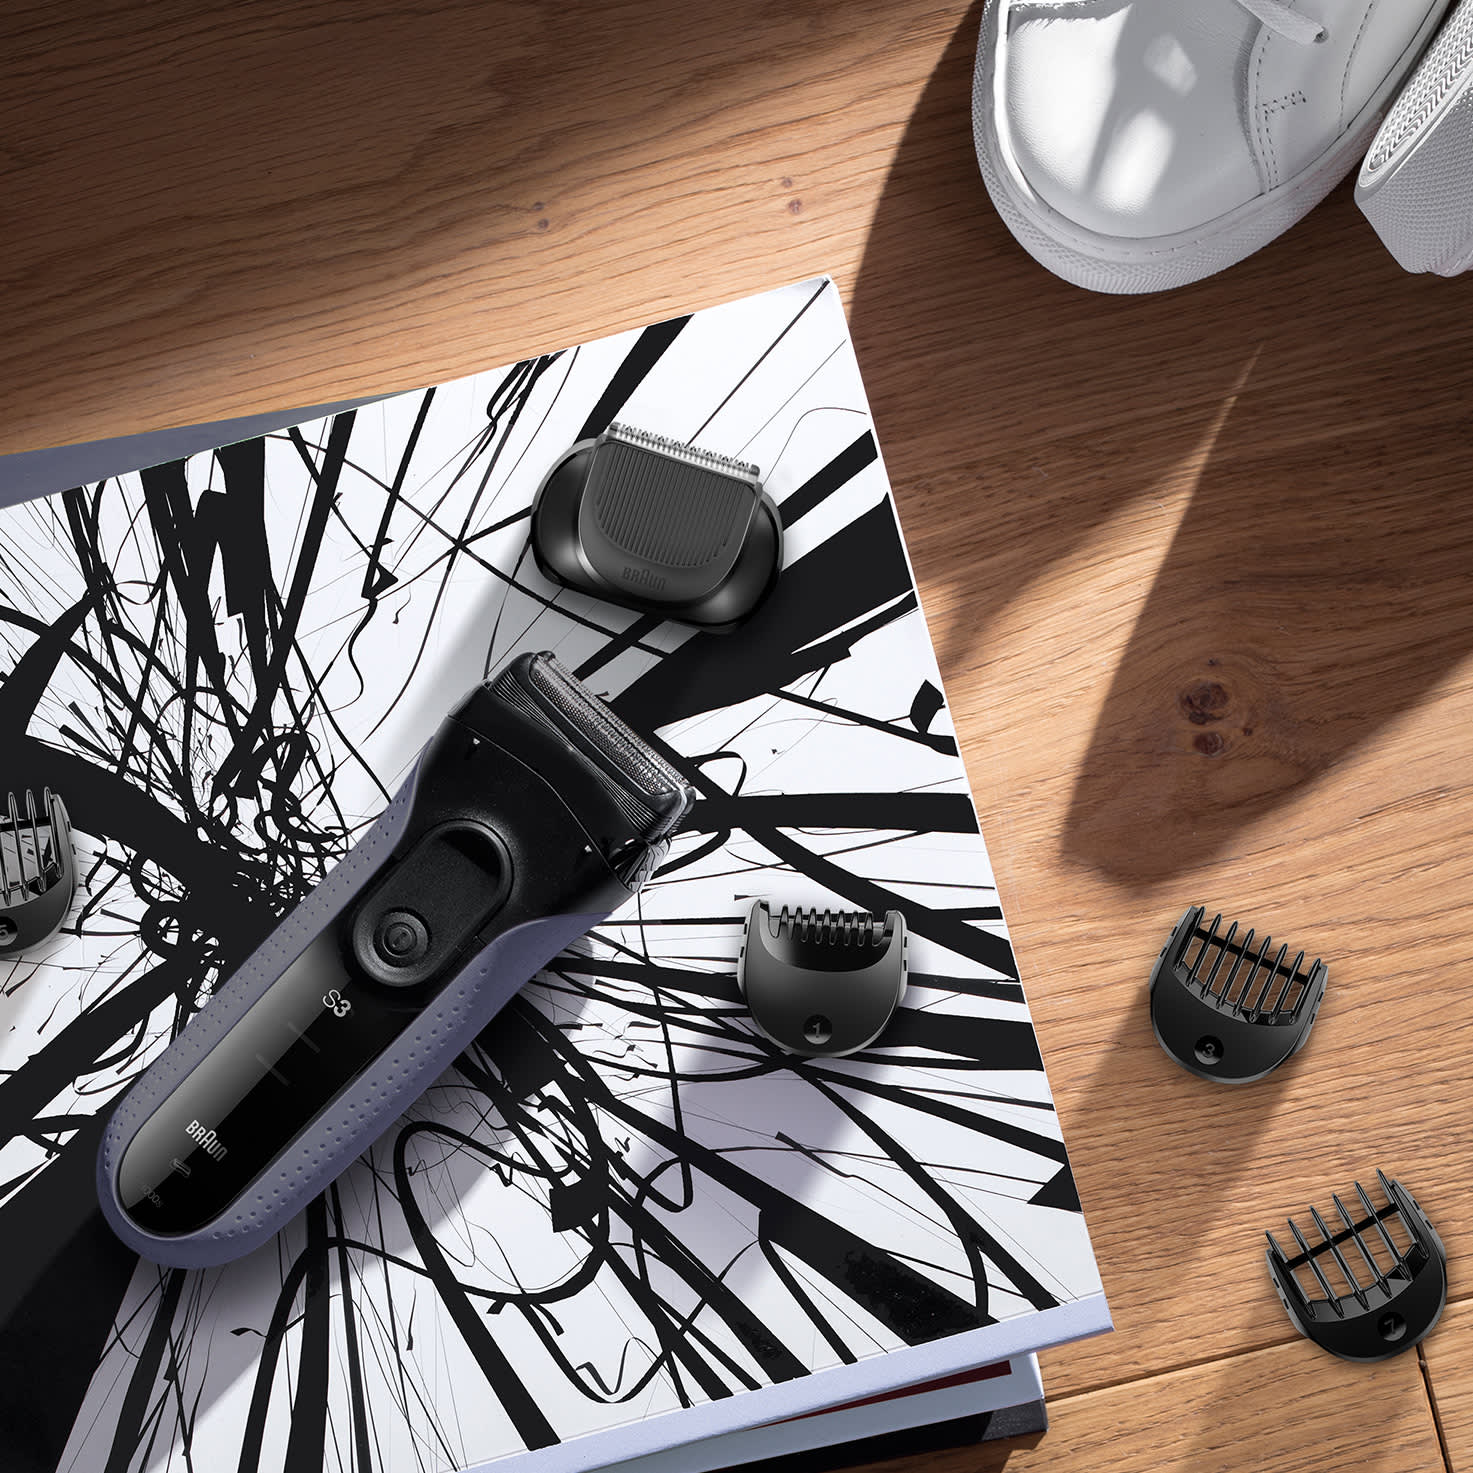 Braun Multi Grooming BT3000 5